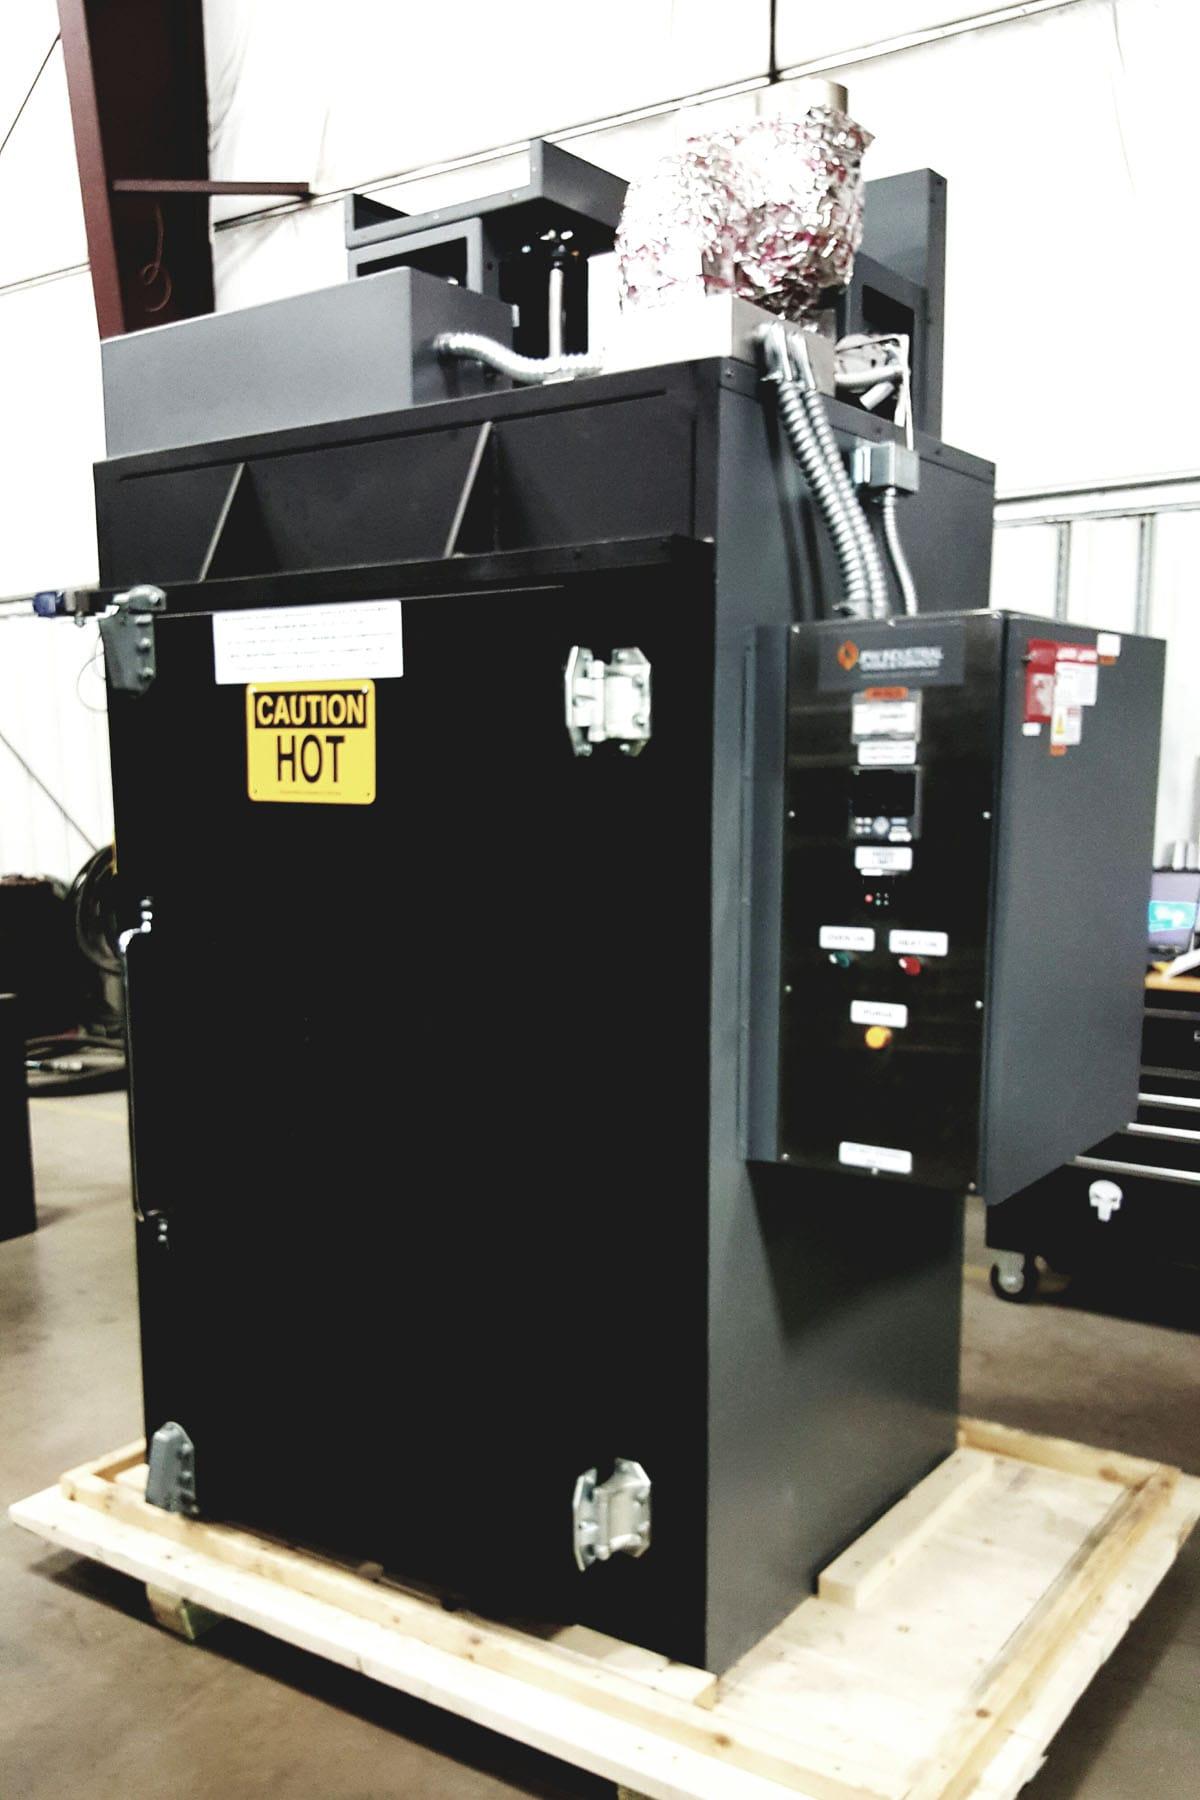 HT242 480V 18KW